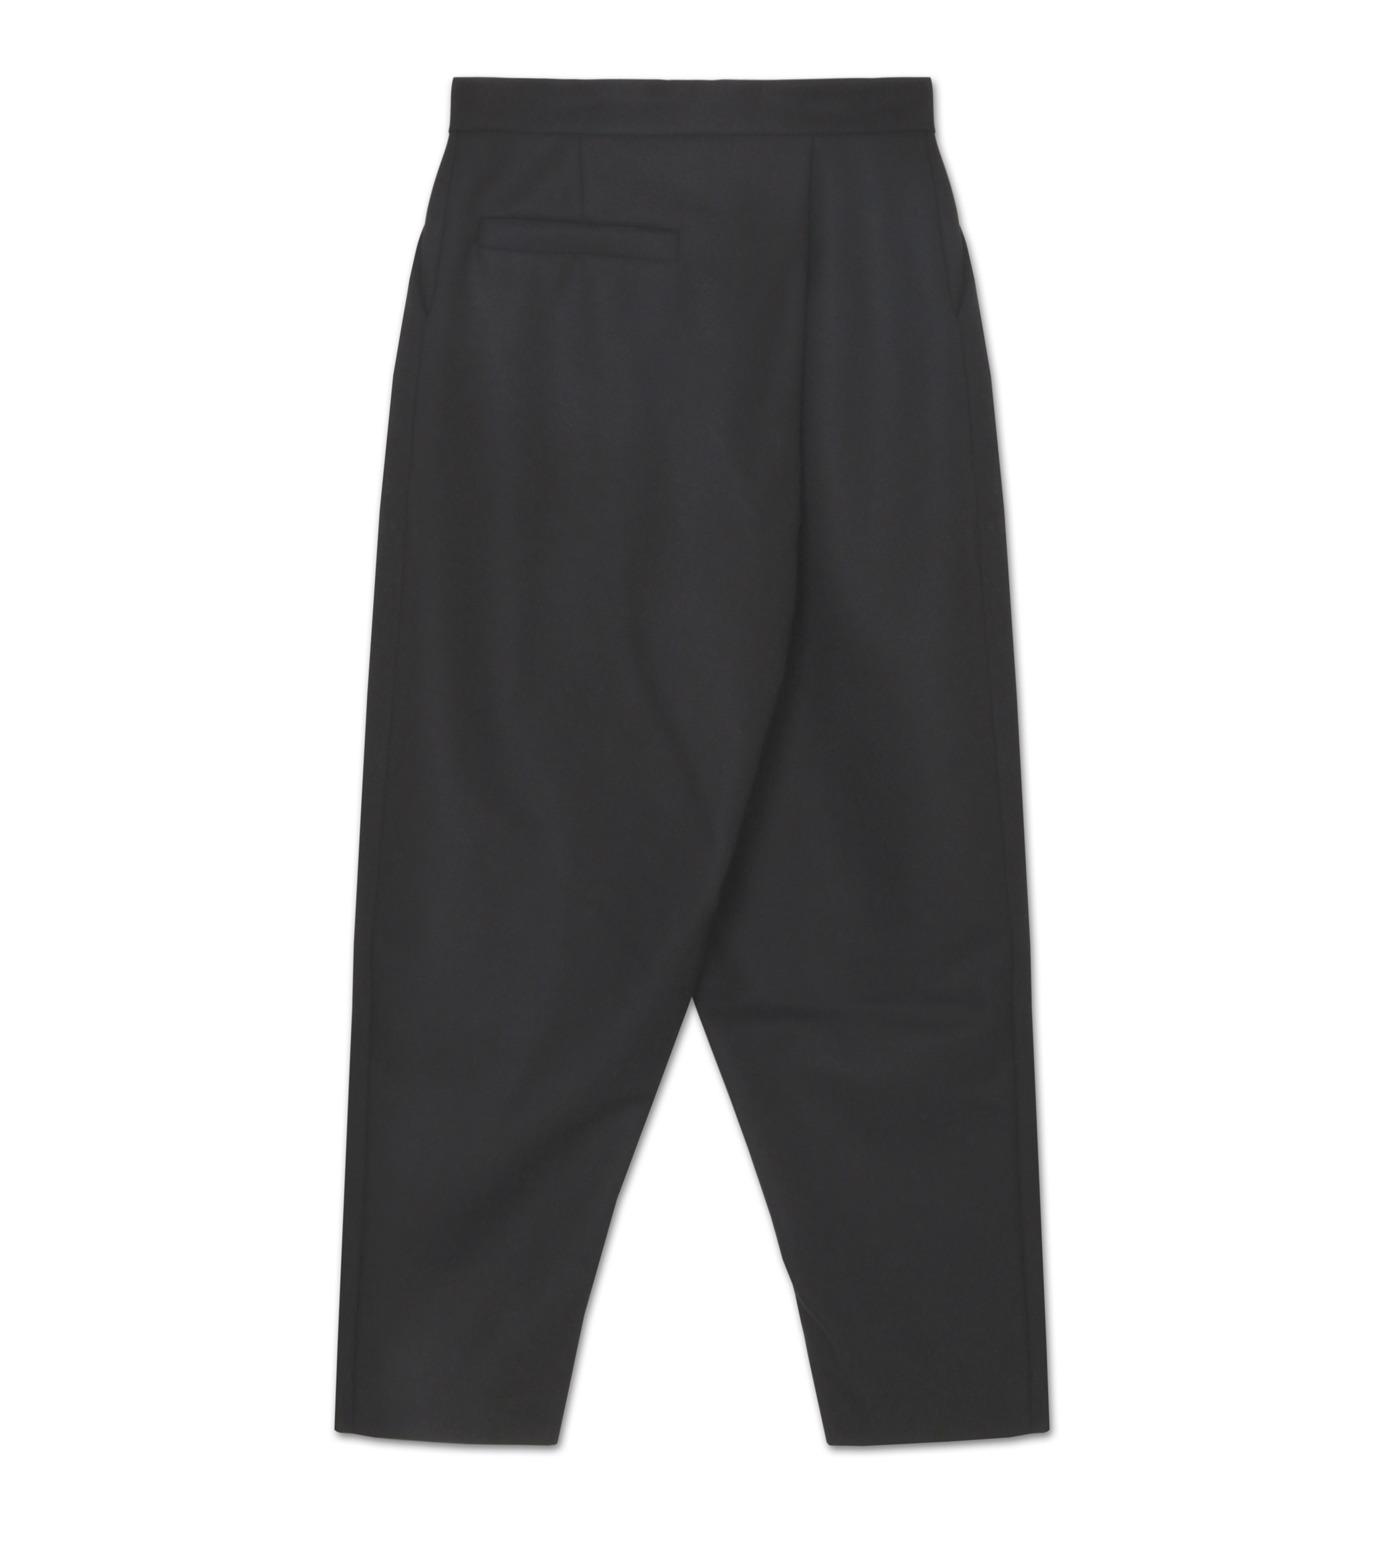 J.W.Anderson(ジェイダブリュー アンダーソン)のPleat Back Trous-BLACK(パンツ/pants)-TR15MA16-13 拡大詳細画像2